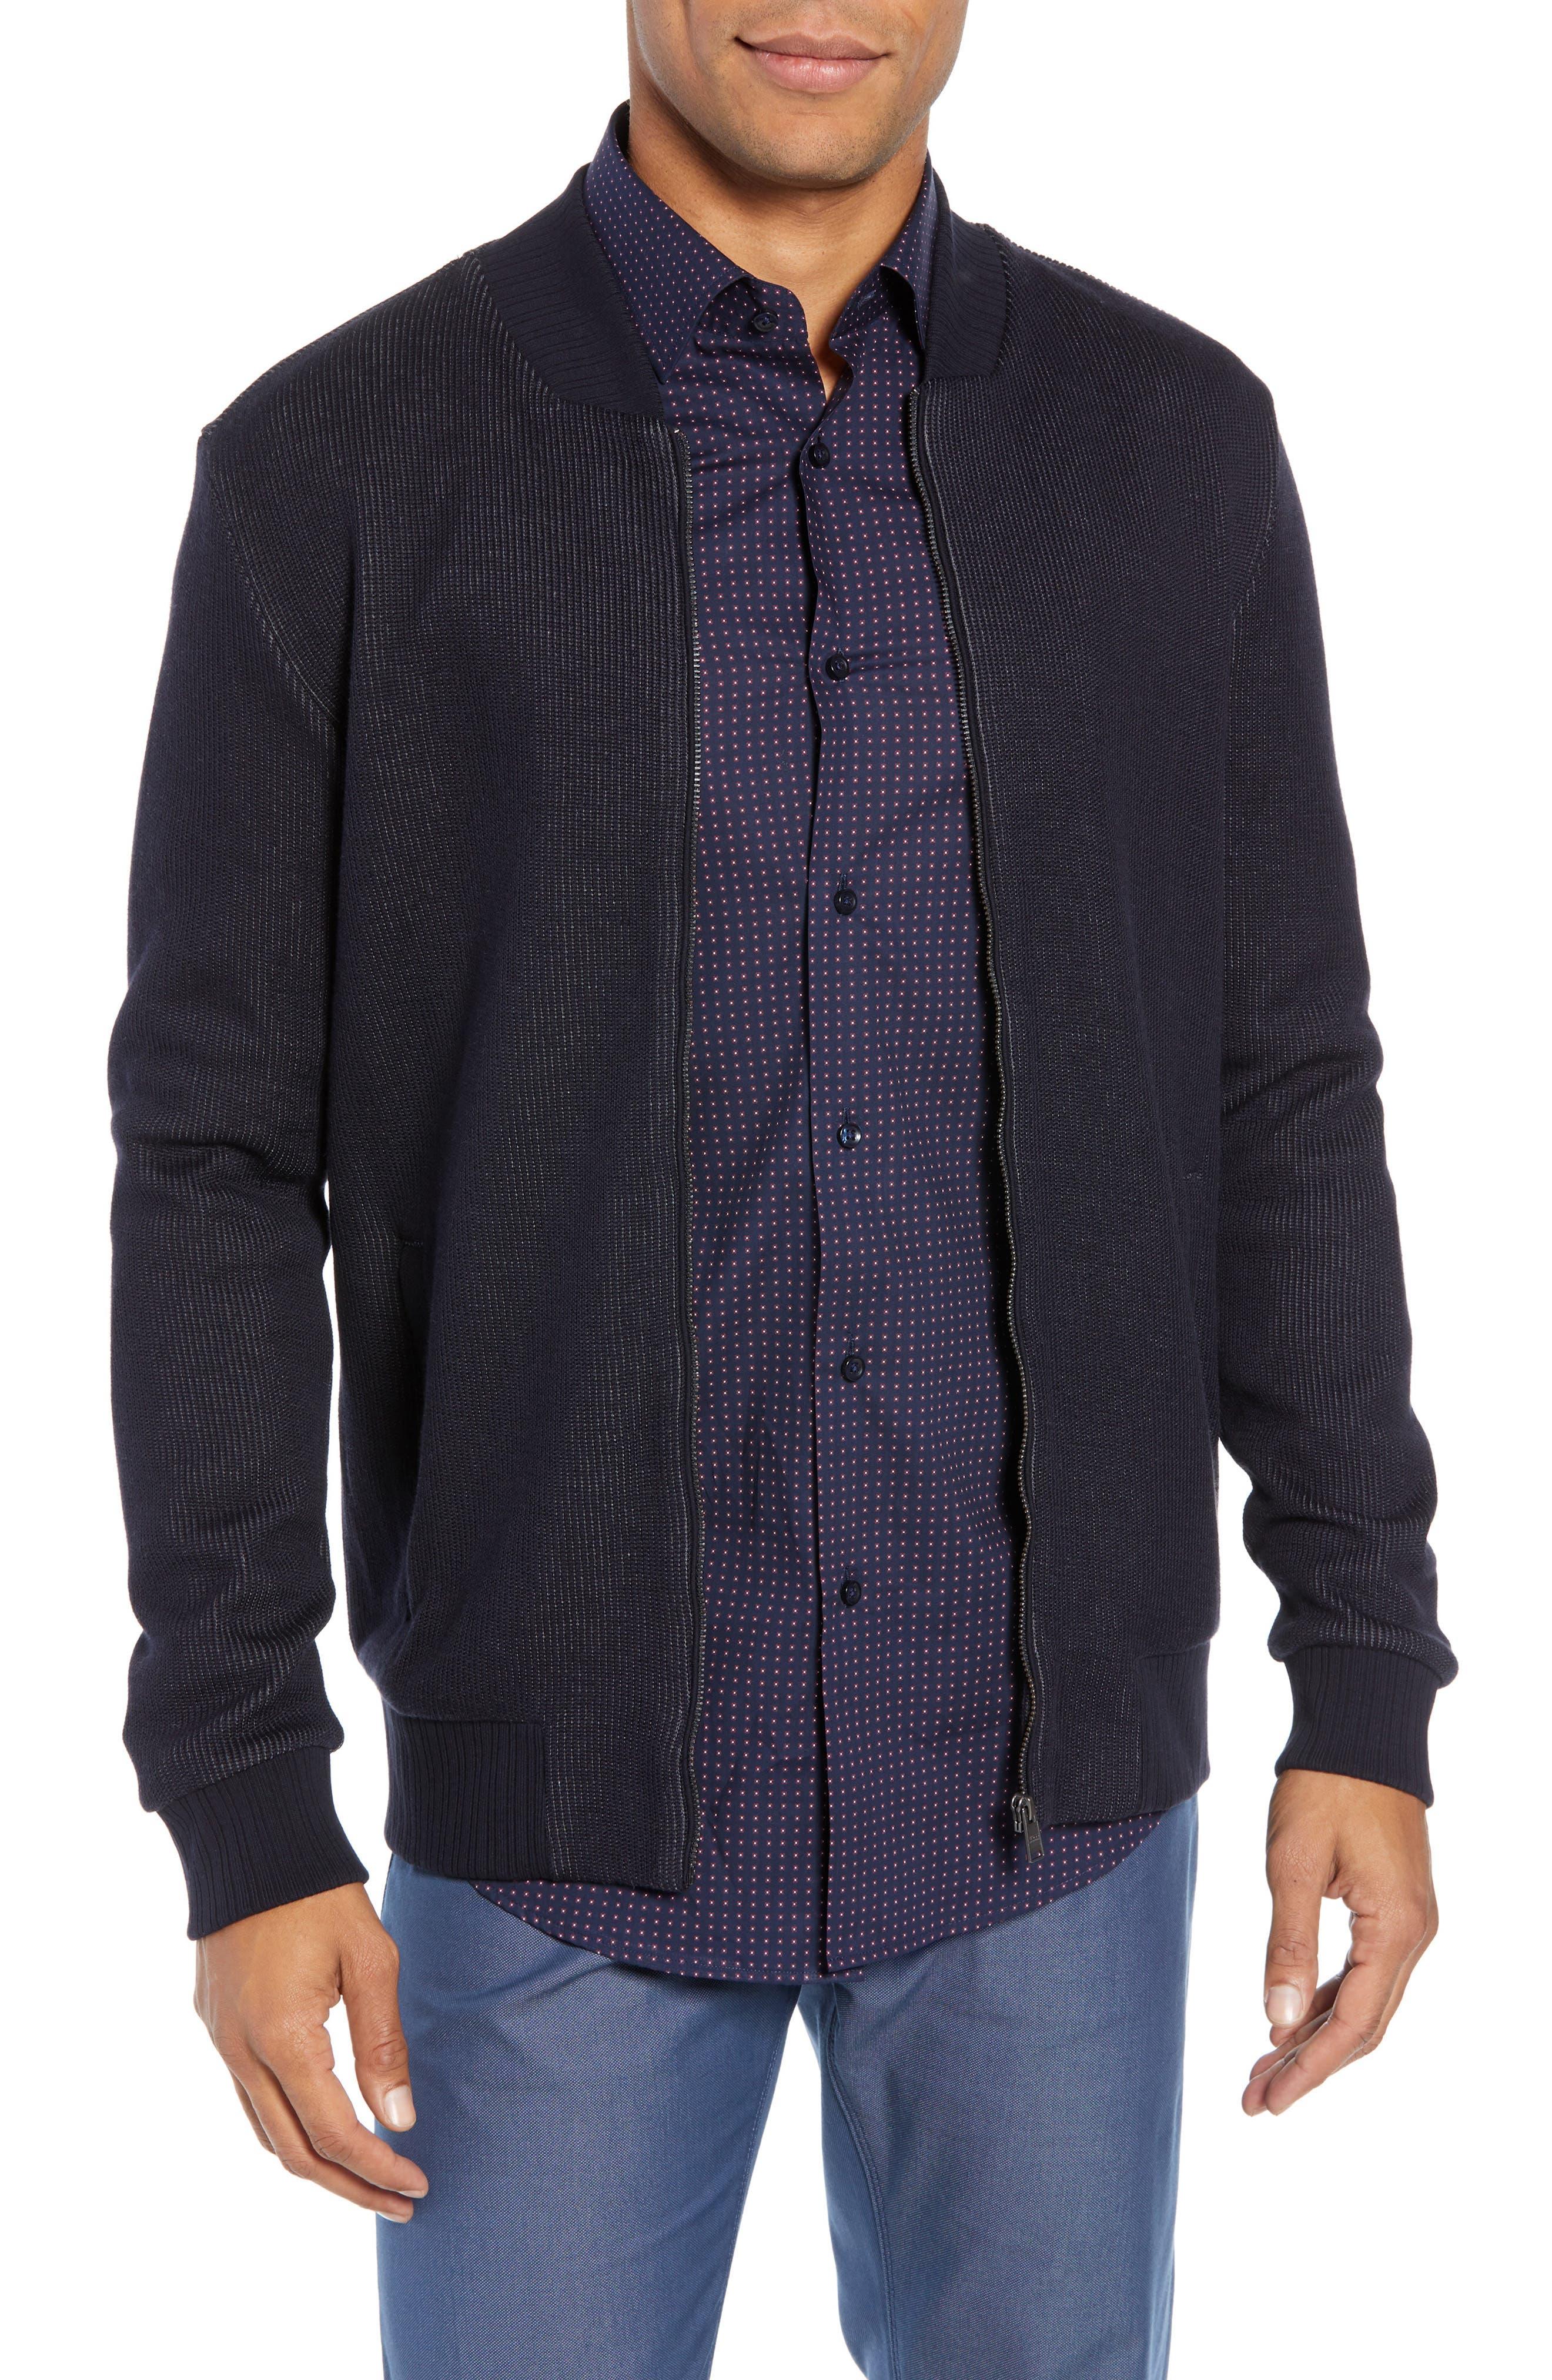 BOSS, Salea Slim Fit Sweatshirt Jacket, Main thumbnail 1, color, BLUE